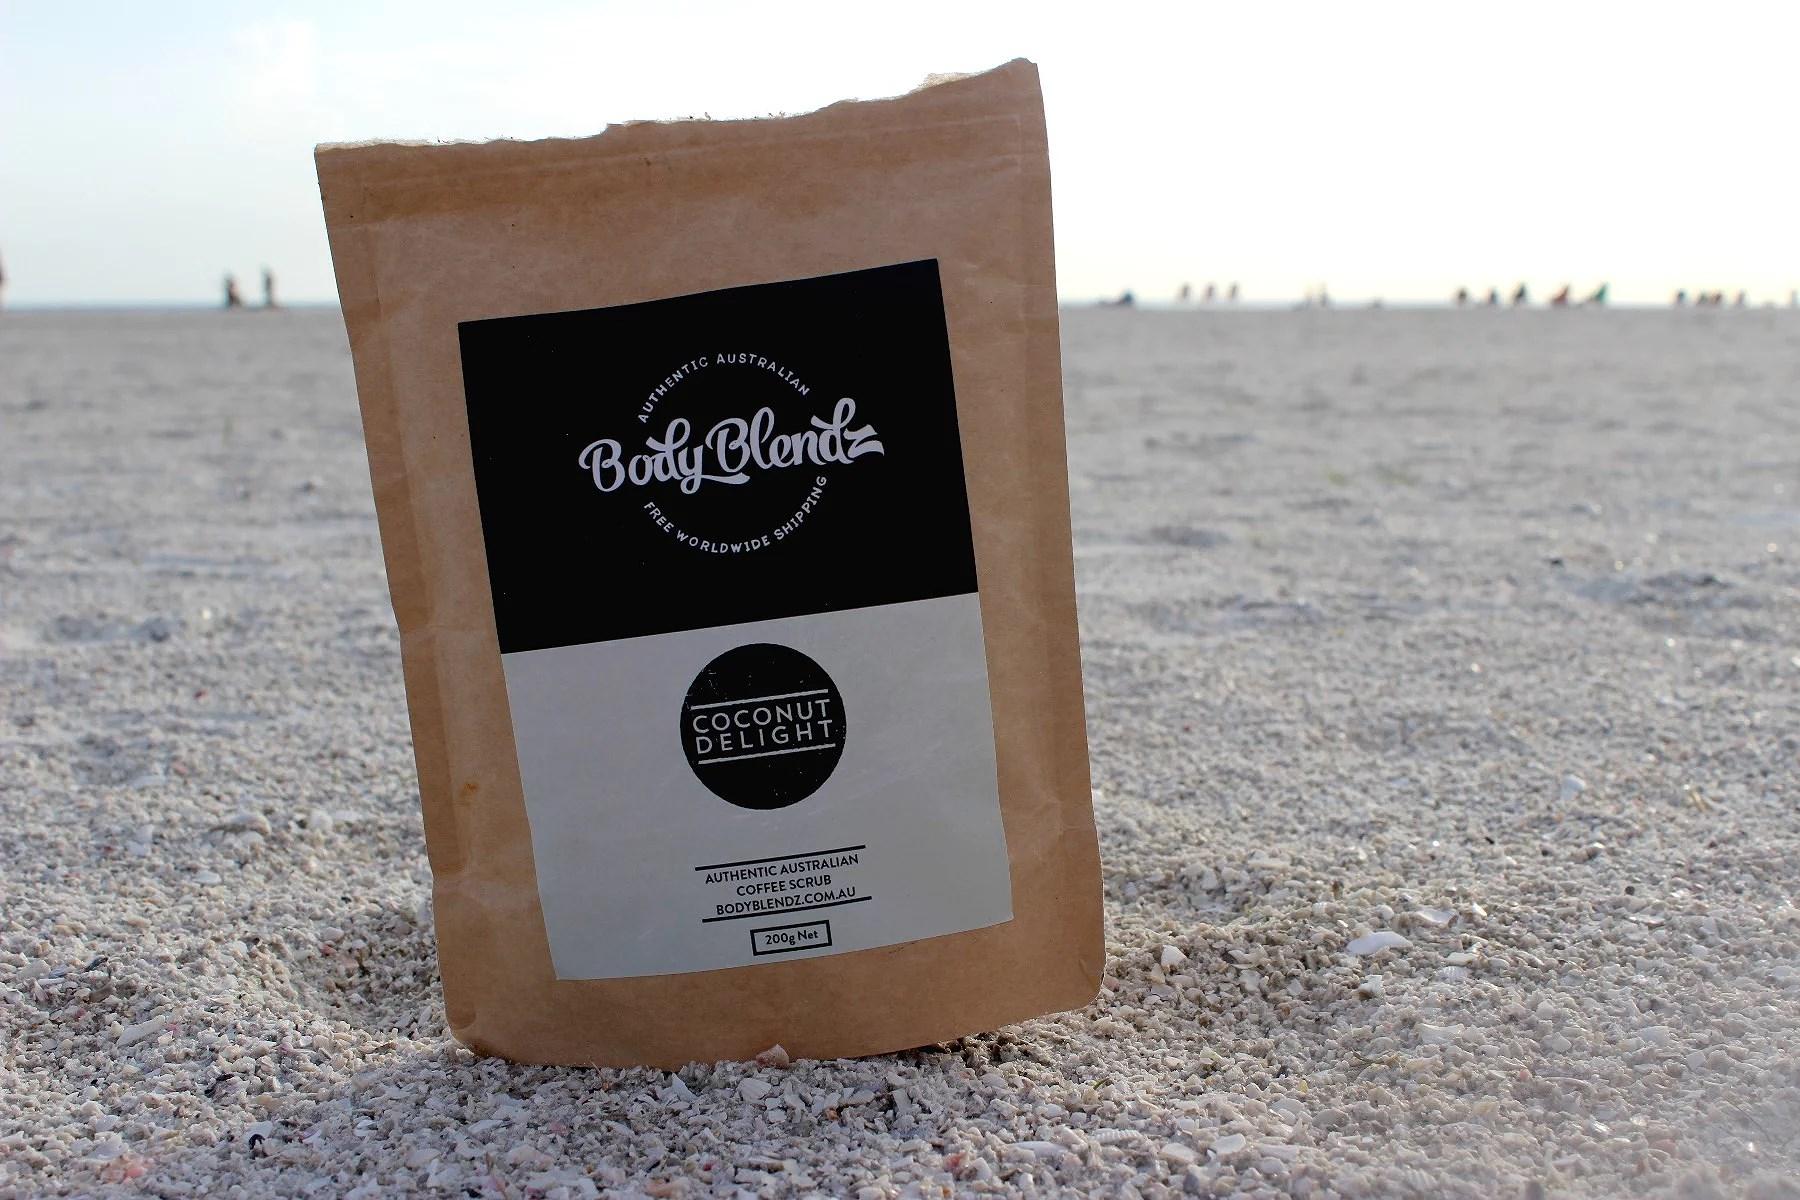 BodyBlendz Coffee Scrub